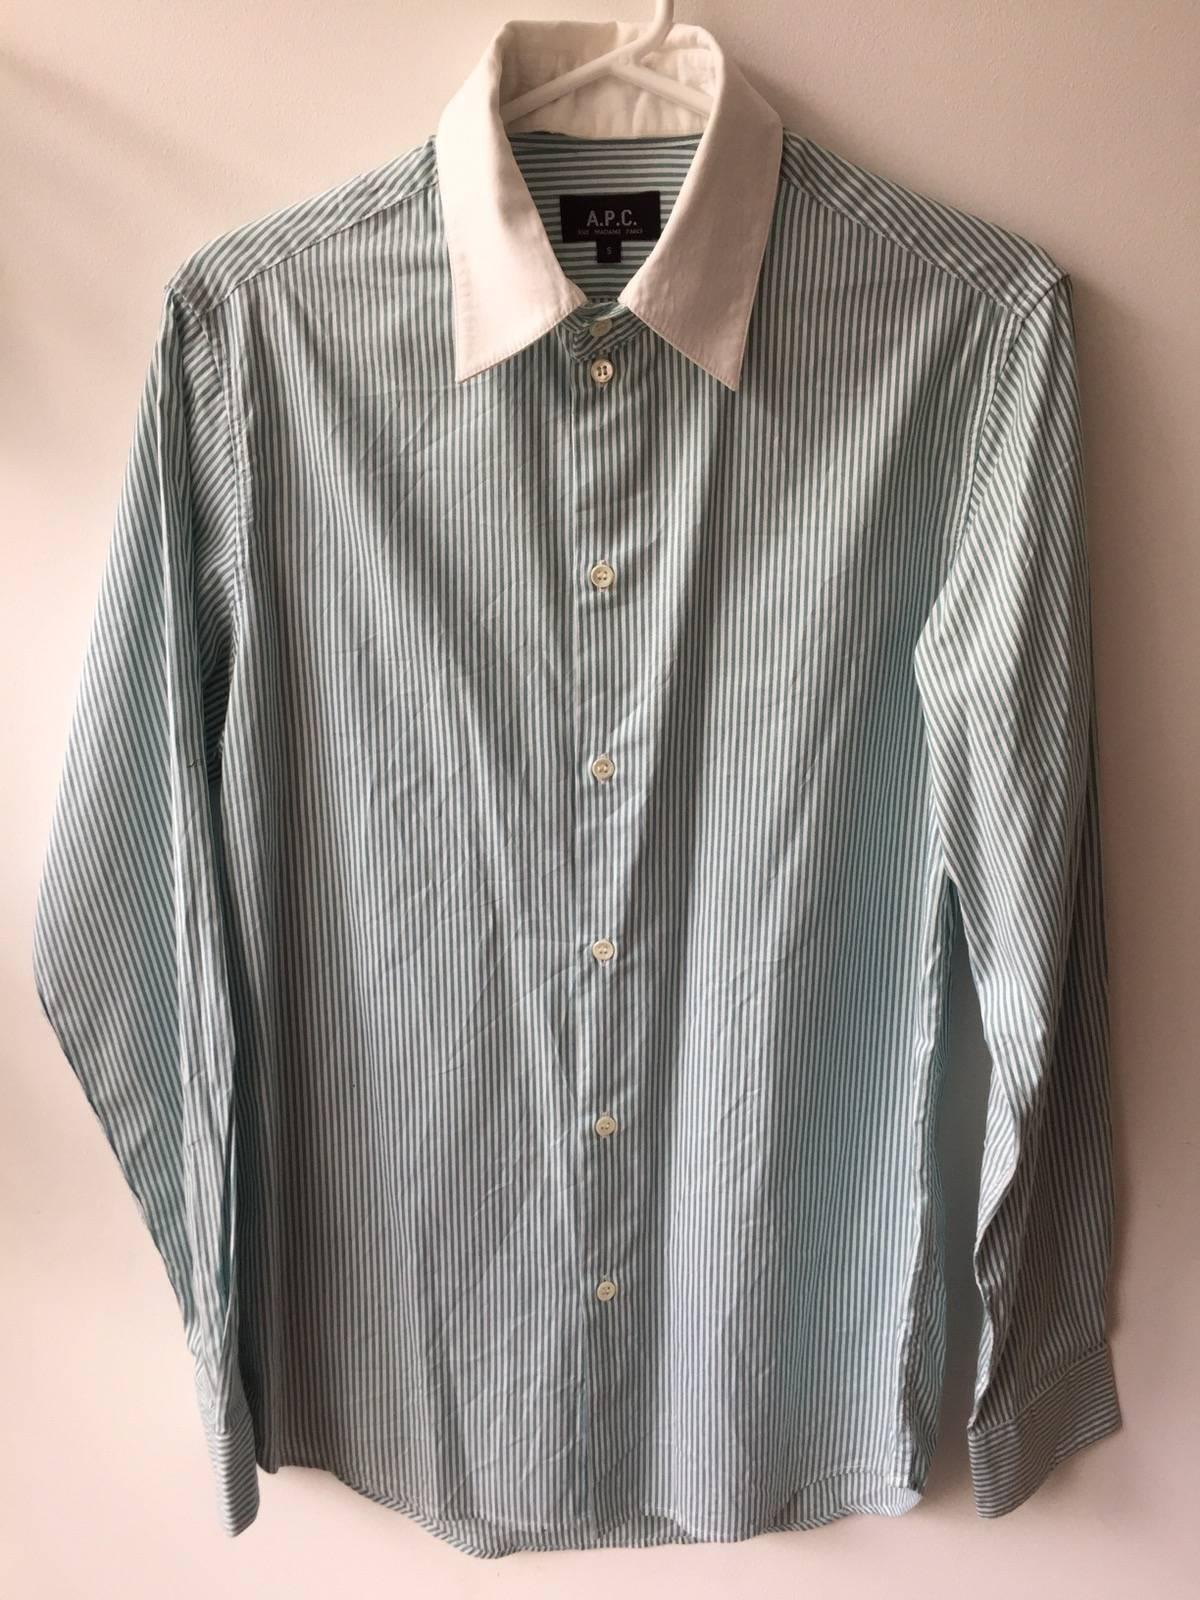 Apc Oxford Shirt Wdetachable Collar Size S Shirts Button Ups